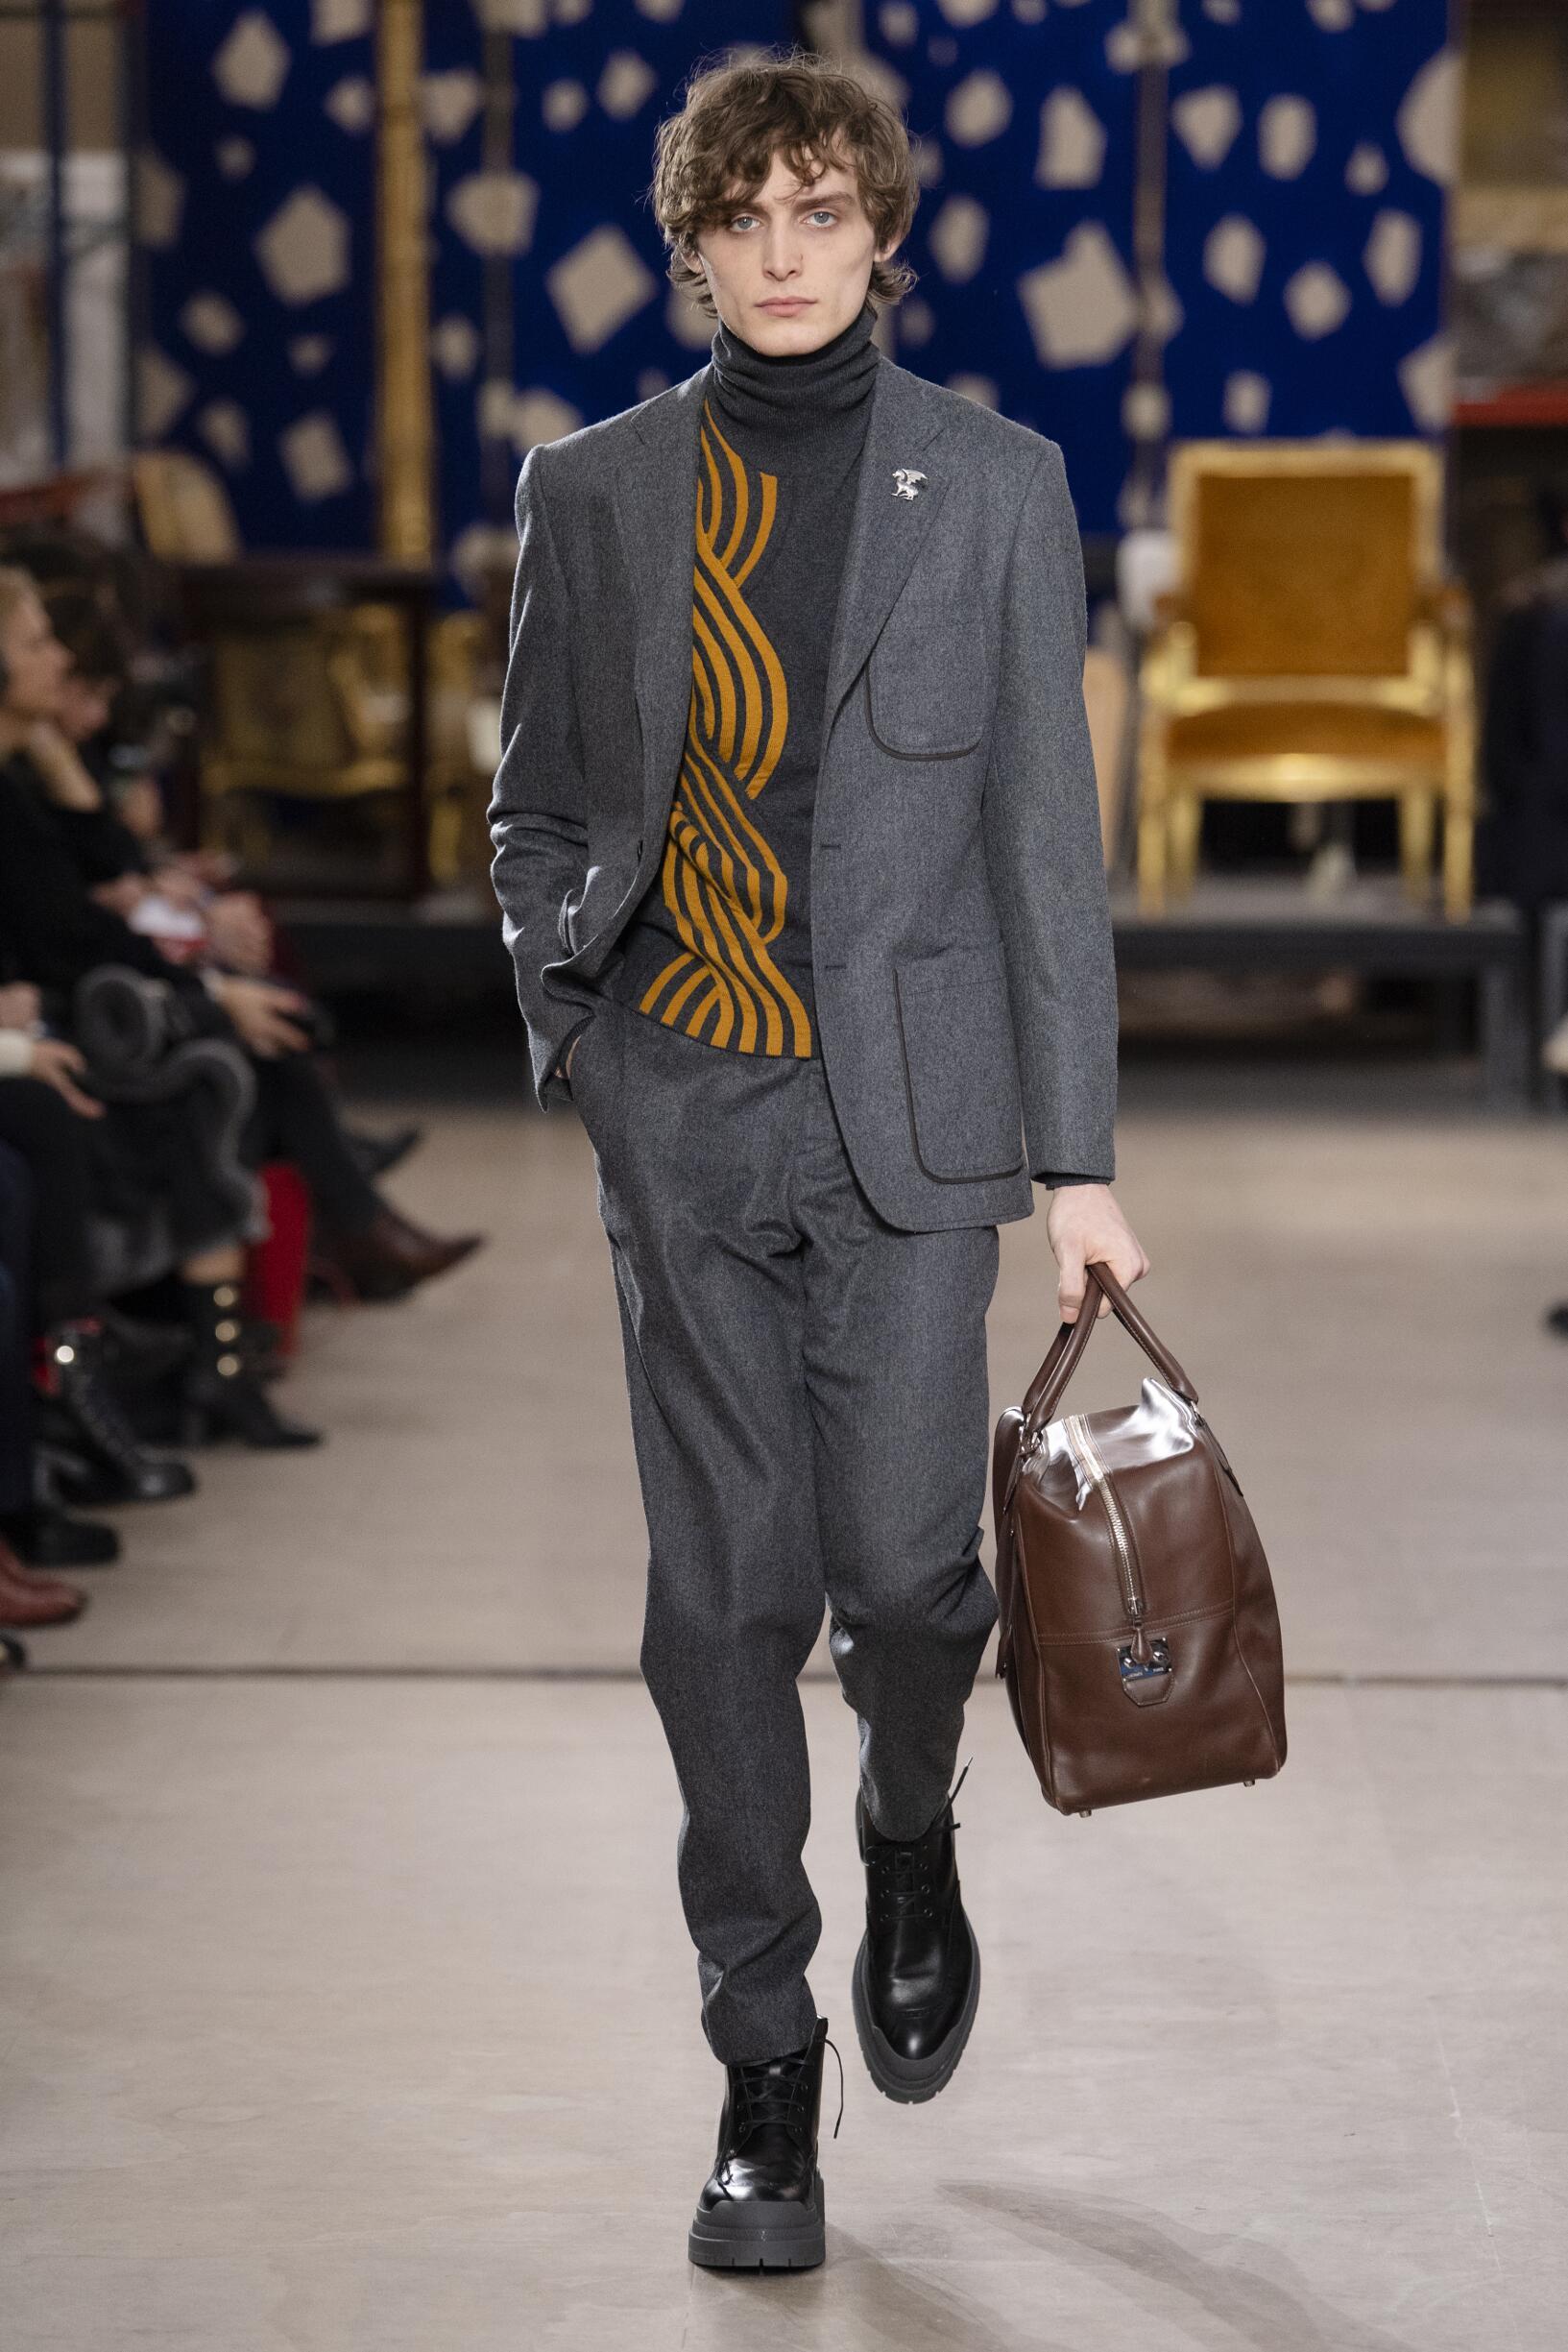 Catwalk Hermès Man Fashion Show Winter 2019